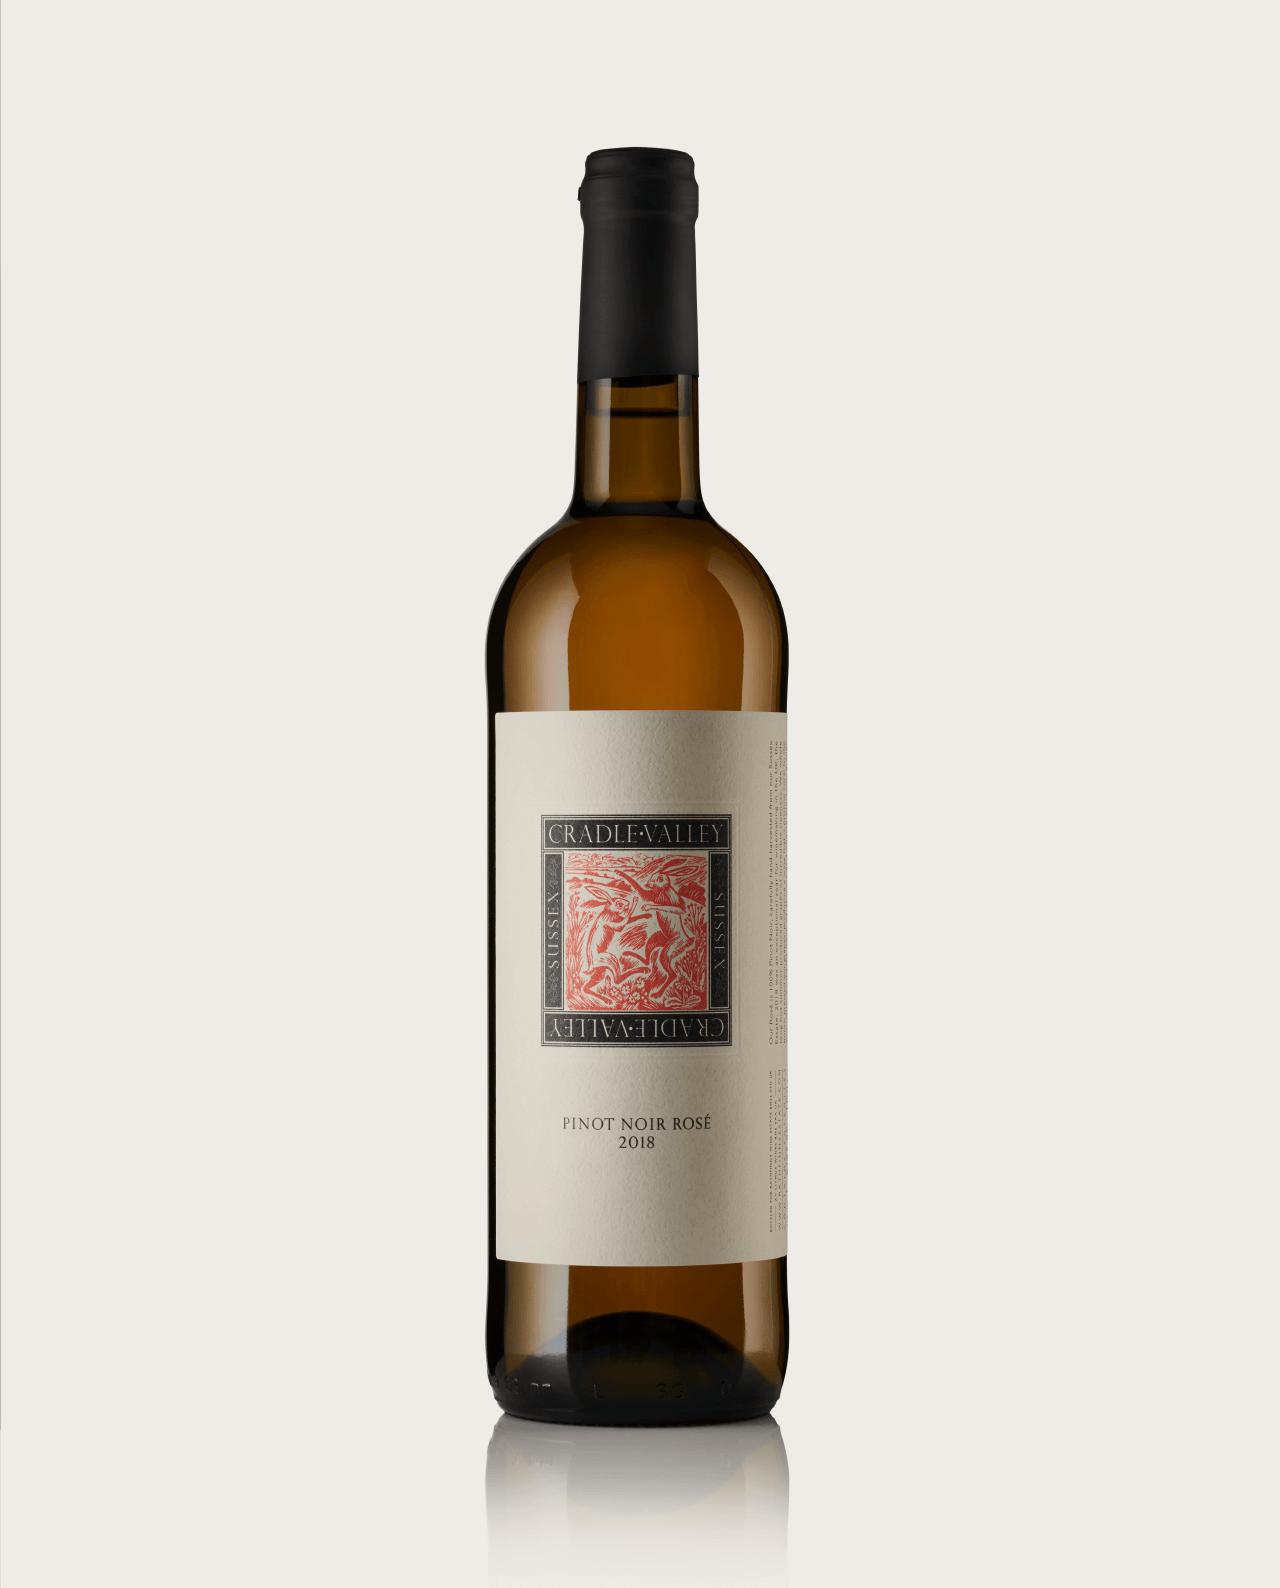 Cradle Valley Pinot Noir Rosé